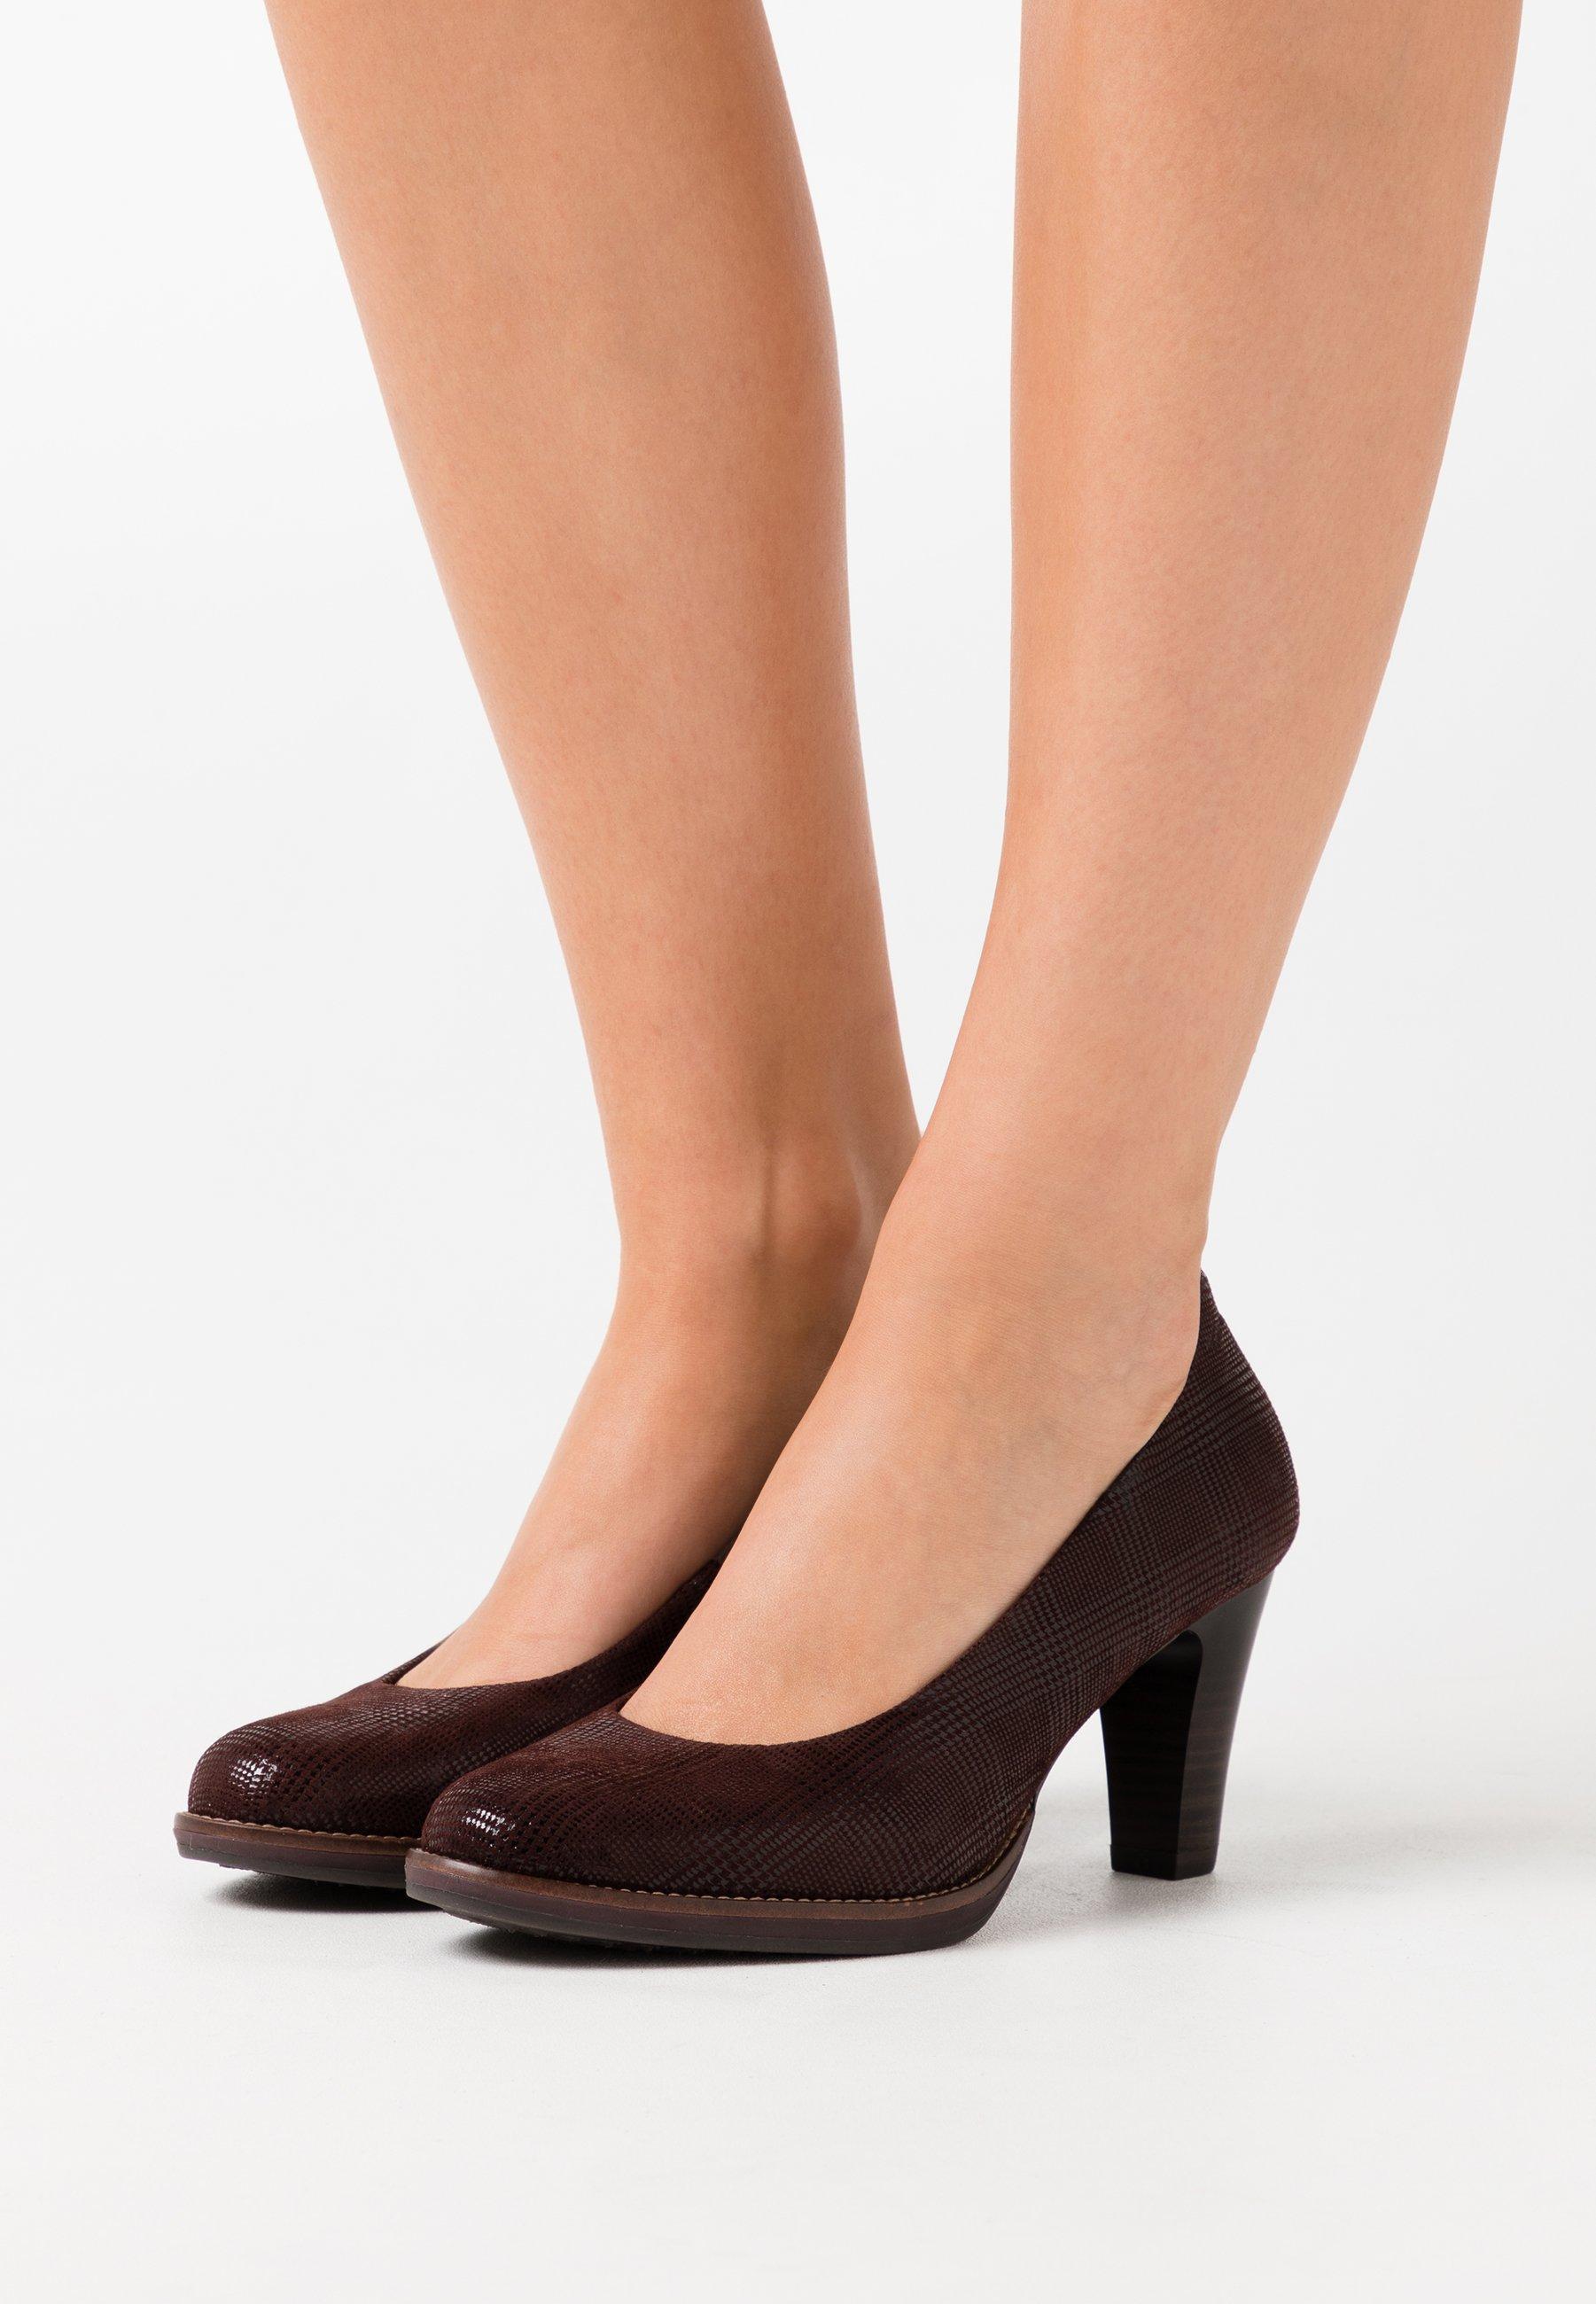 Women COURT SHOE - Classic heels - mocca